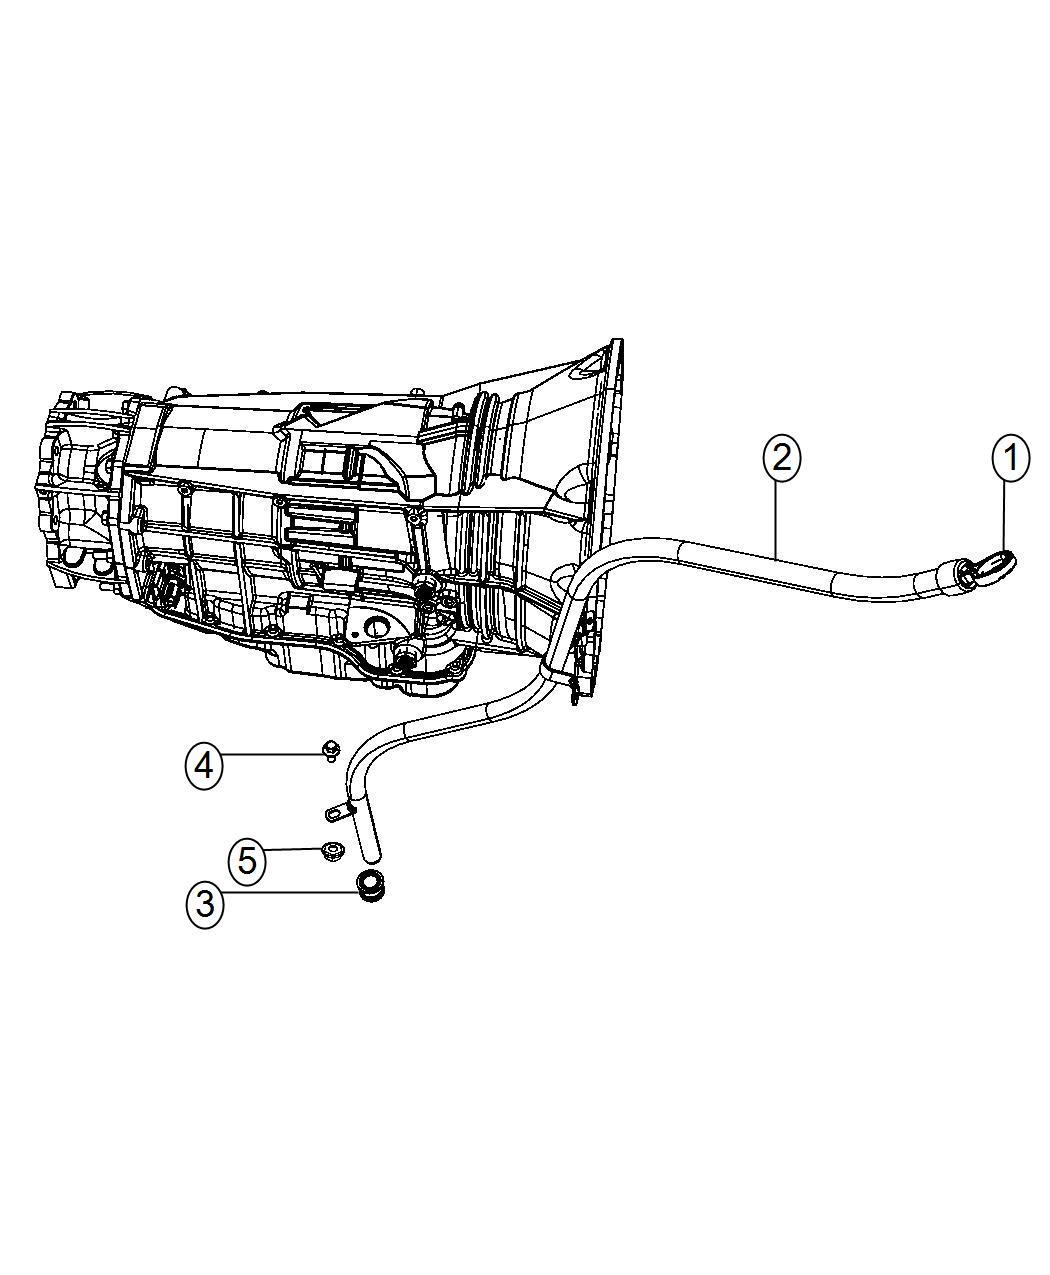 Dodge Ram 2500 3500 Mega Cab 2010 2012 Platinum Oval Step: 2014 Ram 2500 Indicator. Transmission Fluid Level